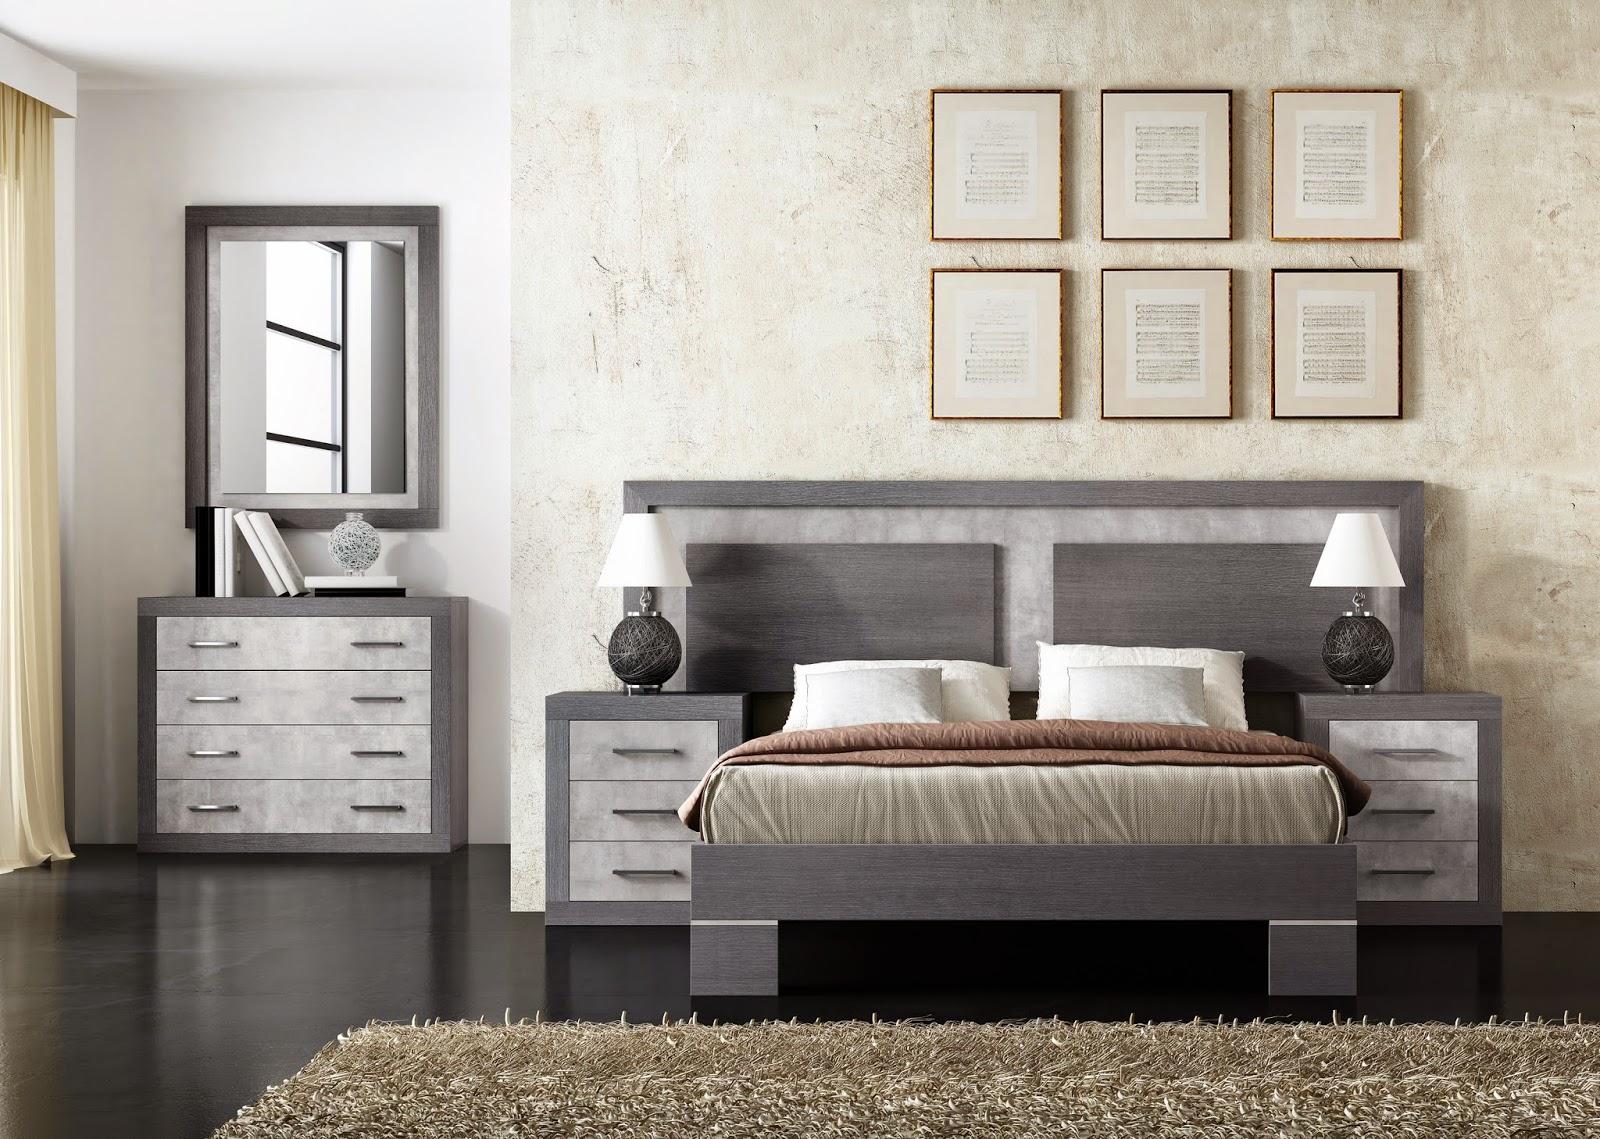 Tu tienda de muebles baratos ahorro total home design idea for Tu muebles catalogo